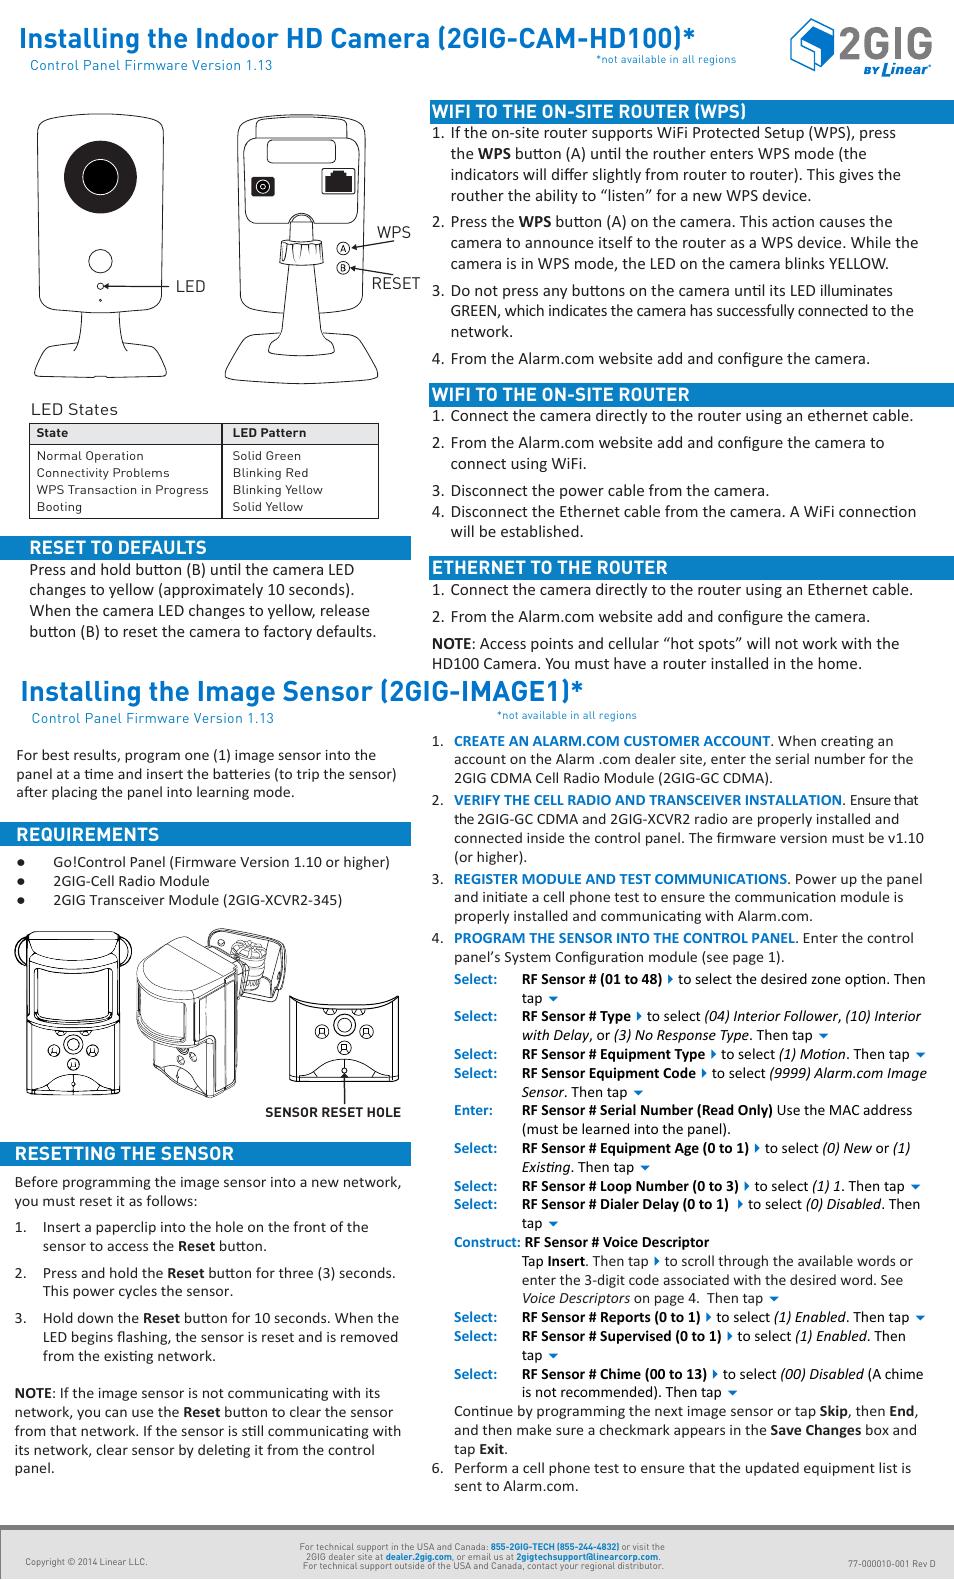 Floodlight Cam Installation Step 2 Manual Guide